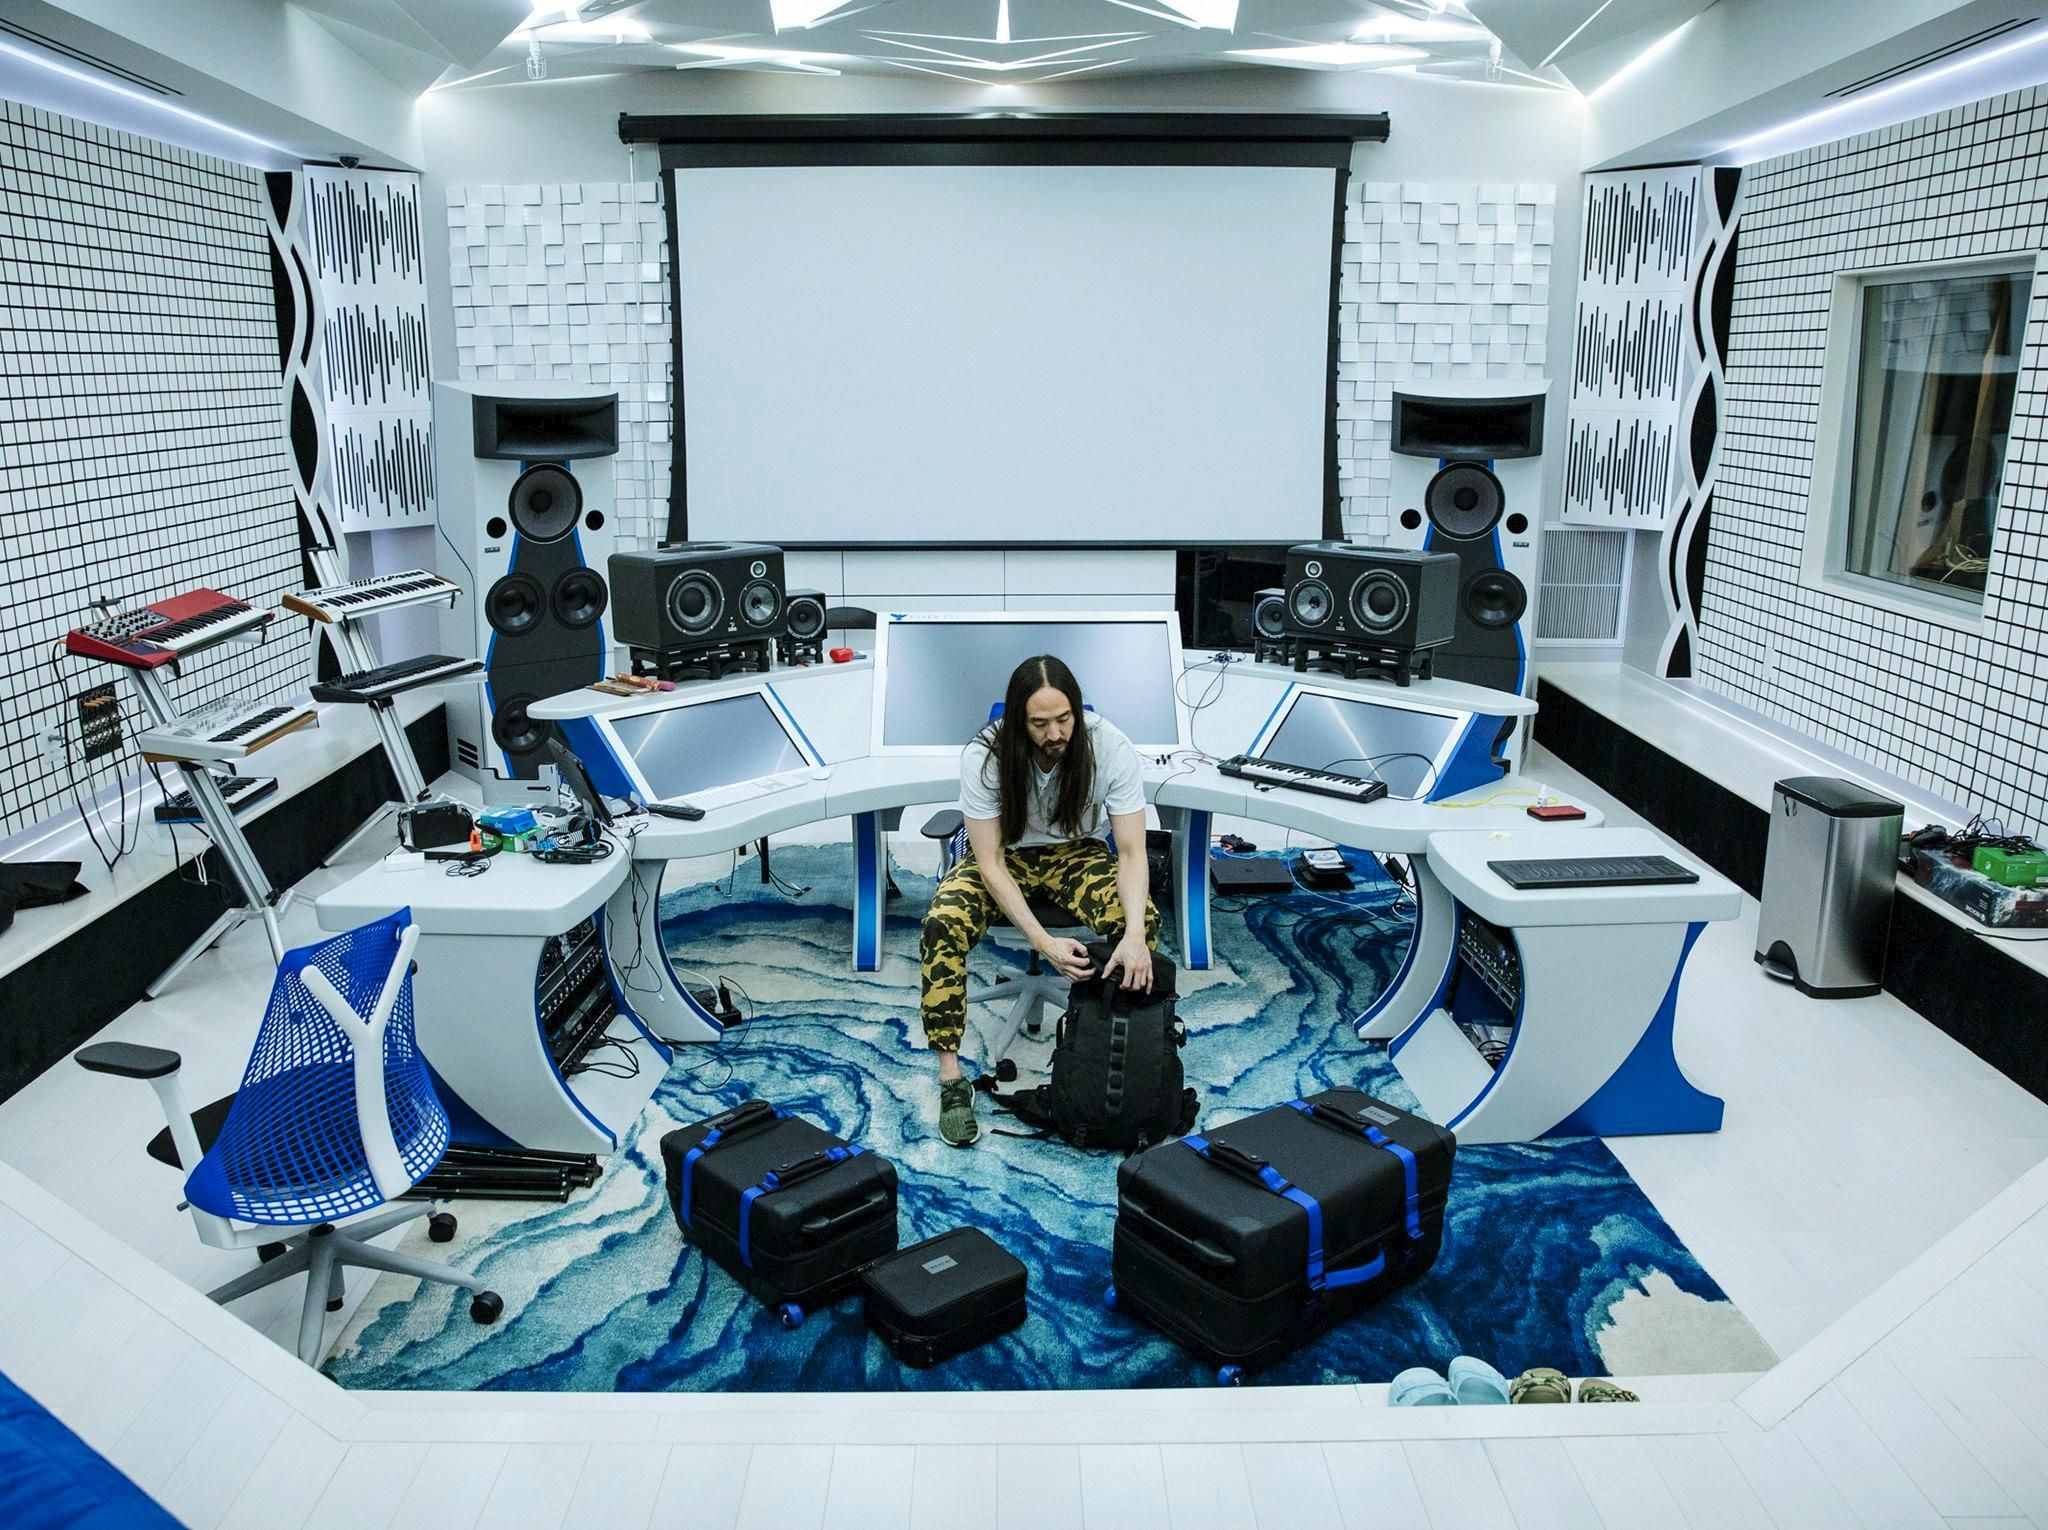 Steve Aoki\'s amazing studio   Spaces & Places   Pinterest   Studio ...